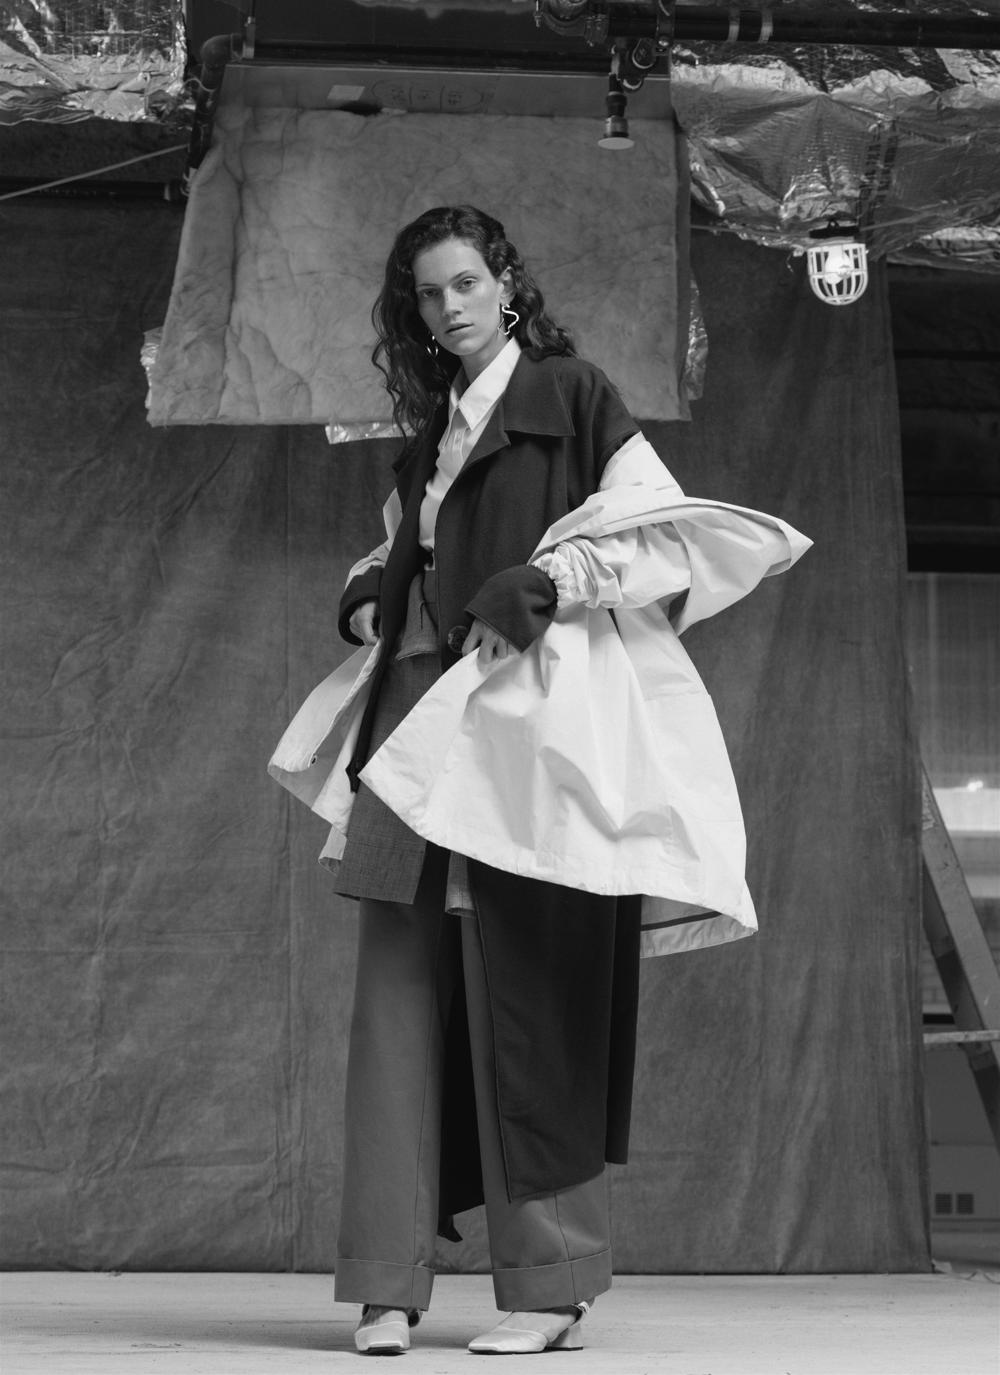 White shirt UNIFORME, white coat SUZANNE RAE, wool coat INDEX, skirt INDEX, pant PARIS GEORGIA BASICS, shoes SUZANNE RAE, earrings ODETTE.